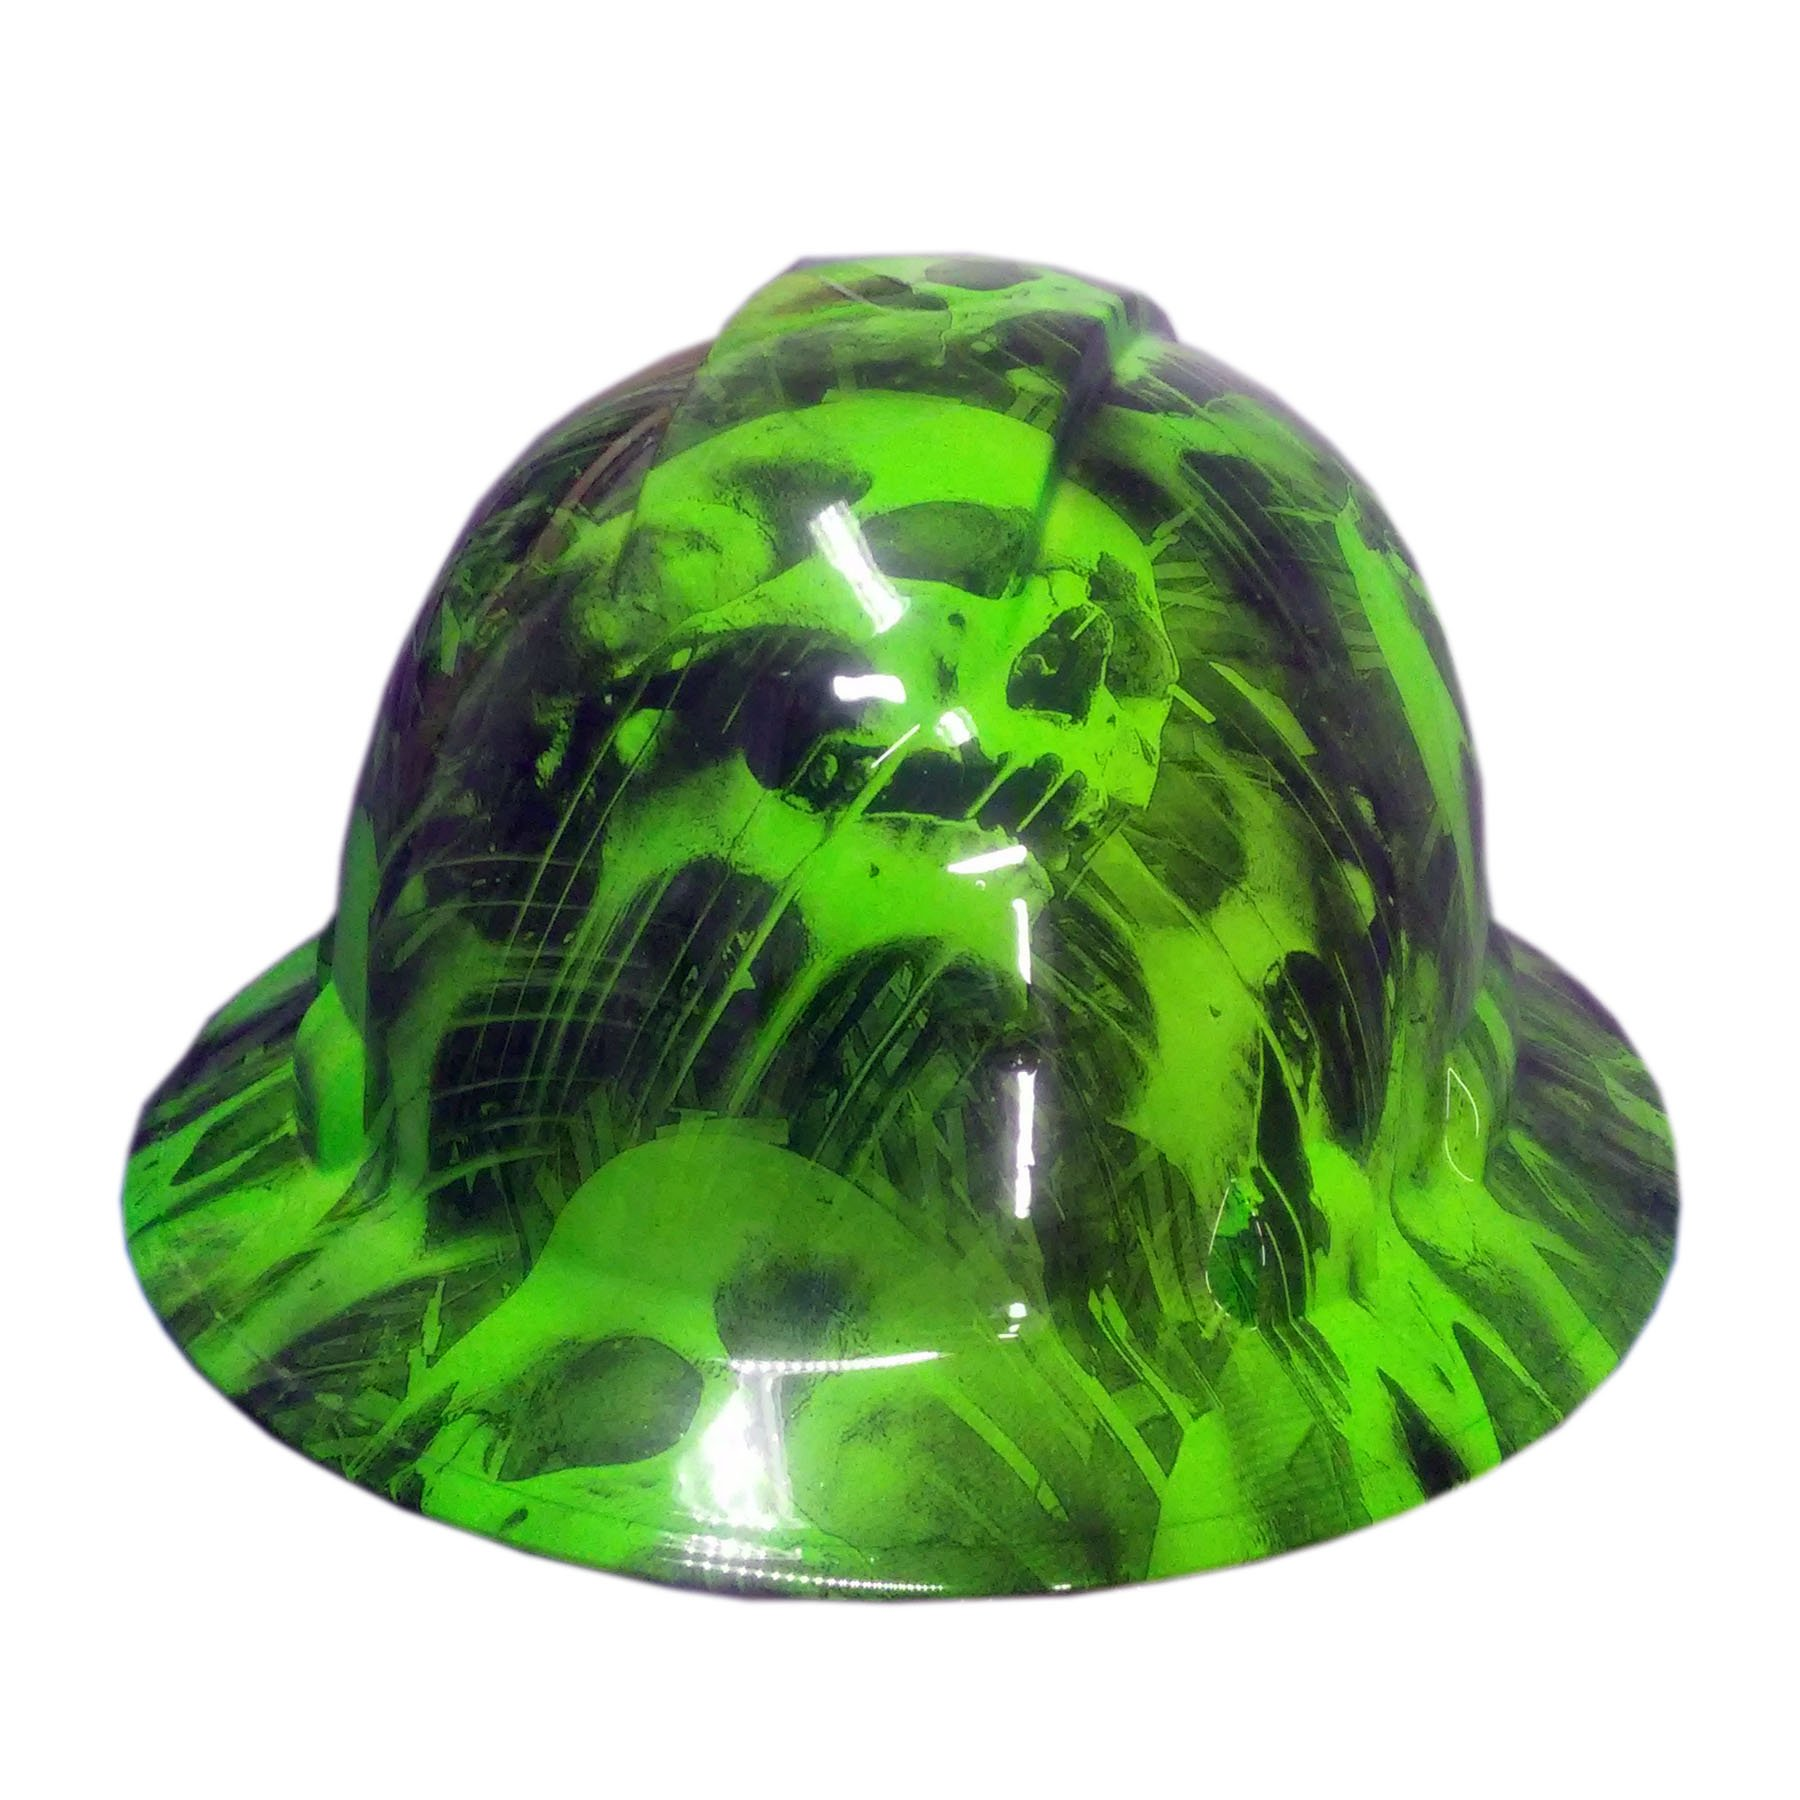 Izzo Graphics Green Toxic Skull Pyramex Ridgeline Full Brim Hard Hat